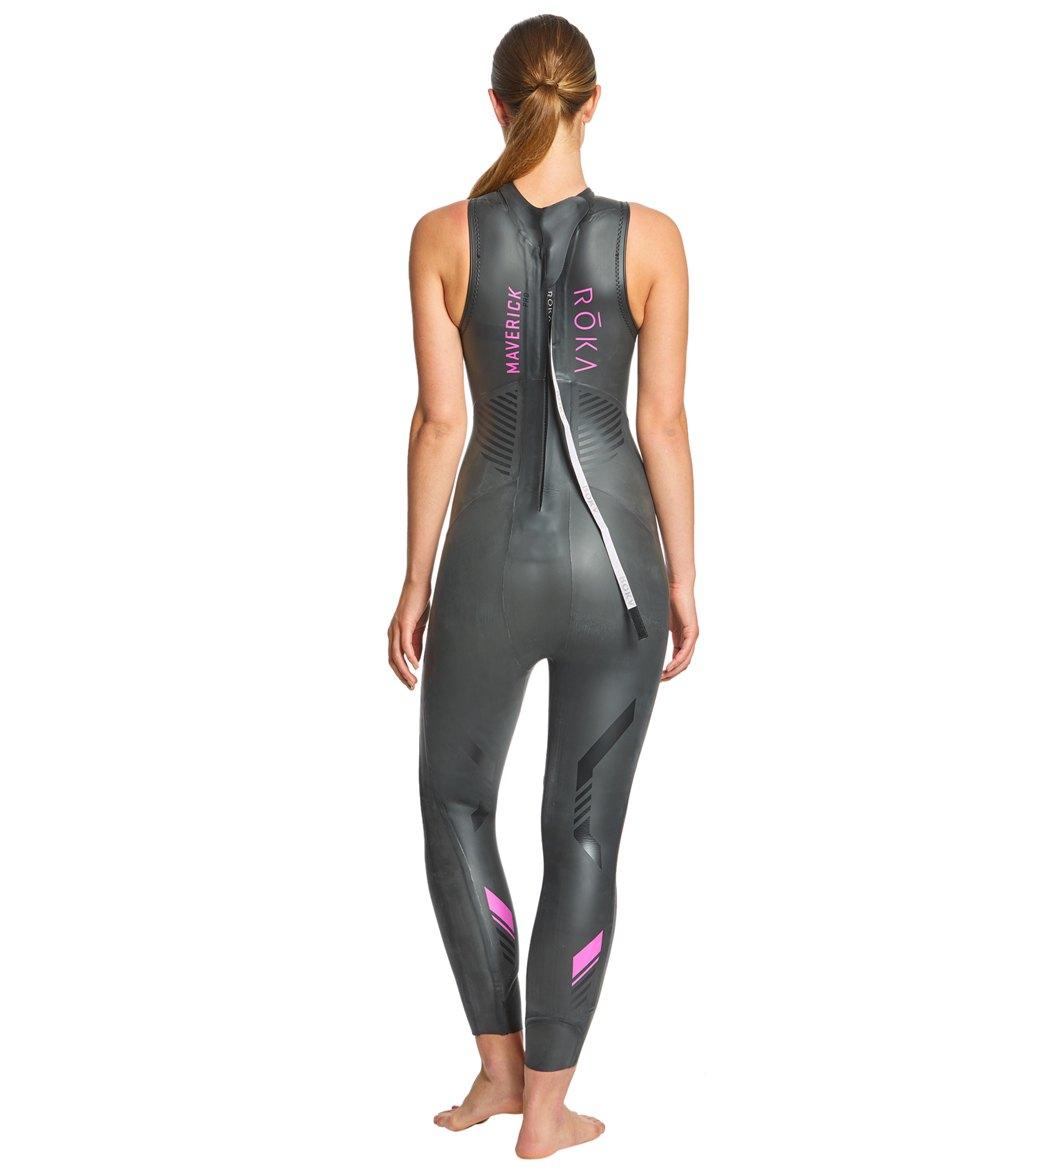 ROKA Women s Maverick Pro II Sleeveless Tri Wetsuit at SwimOutlet ... 2df0055f0